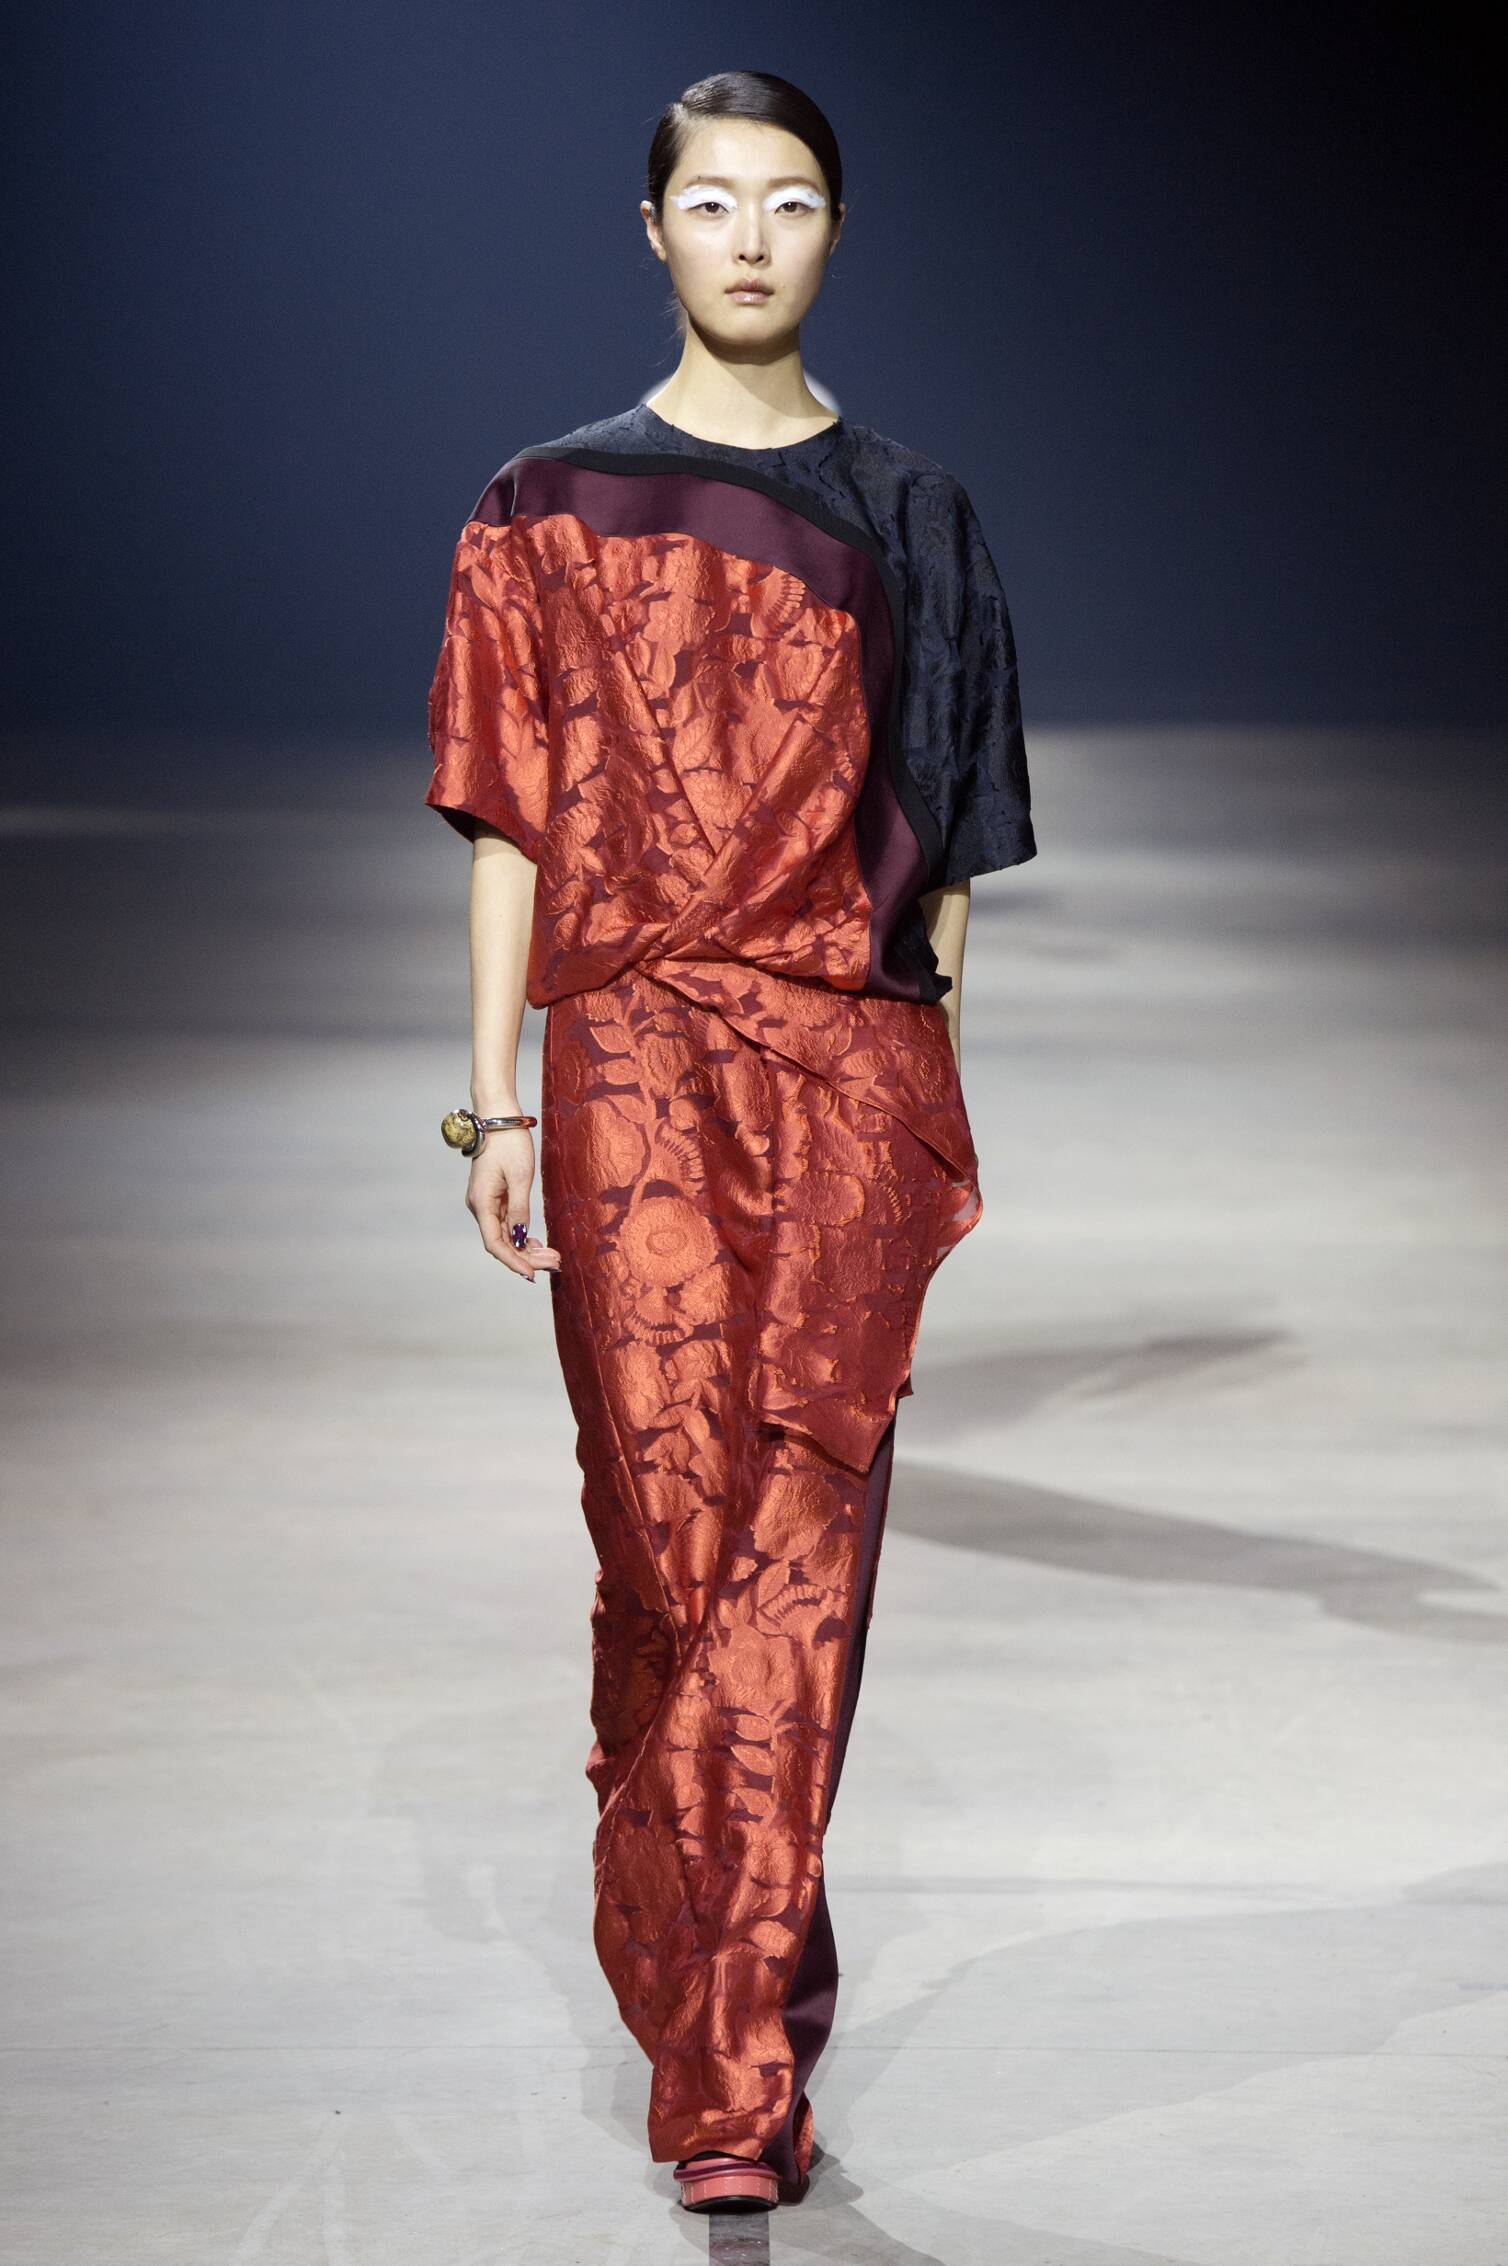 Catwalk Kenzo Womenswear Collection Winter 2015